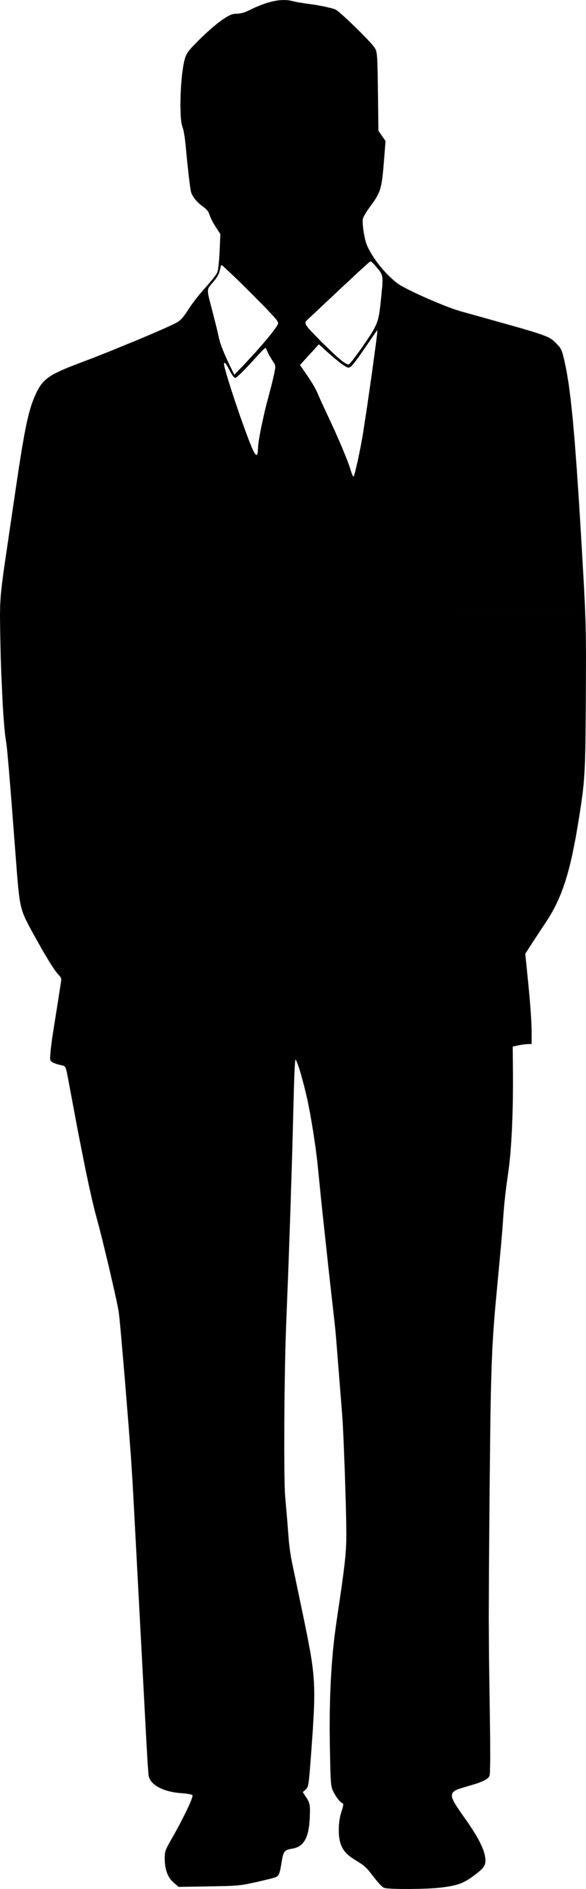 586x1889 109 Best Sjabloon Images On Silhouettes, Dit Ben Ik